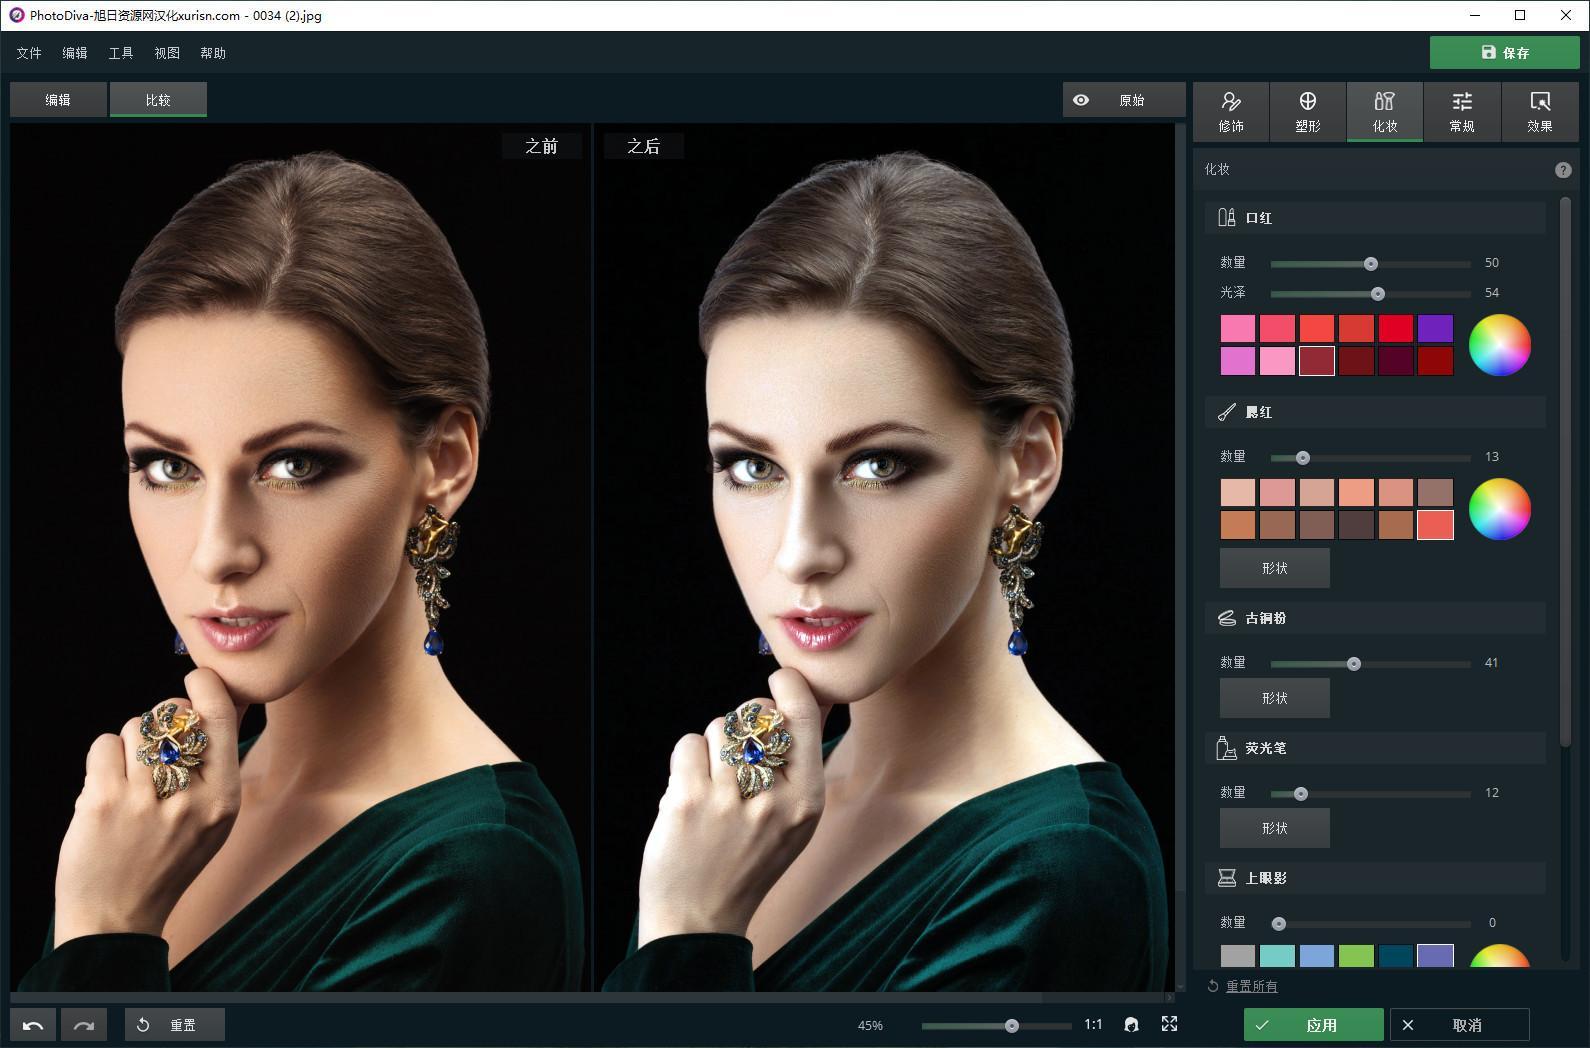 VIP资源-PhotoDiva Pro 3.0汉化版 快捷人像美容塑形修肤化妆照片编辑器(4)